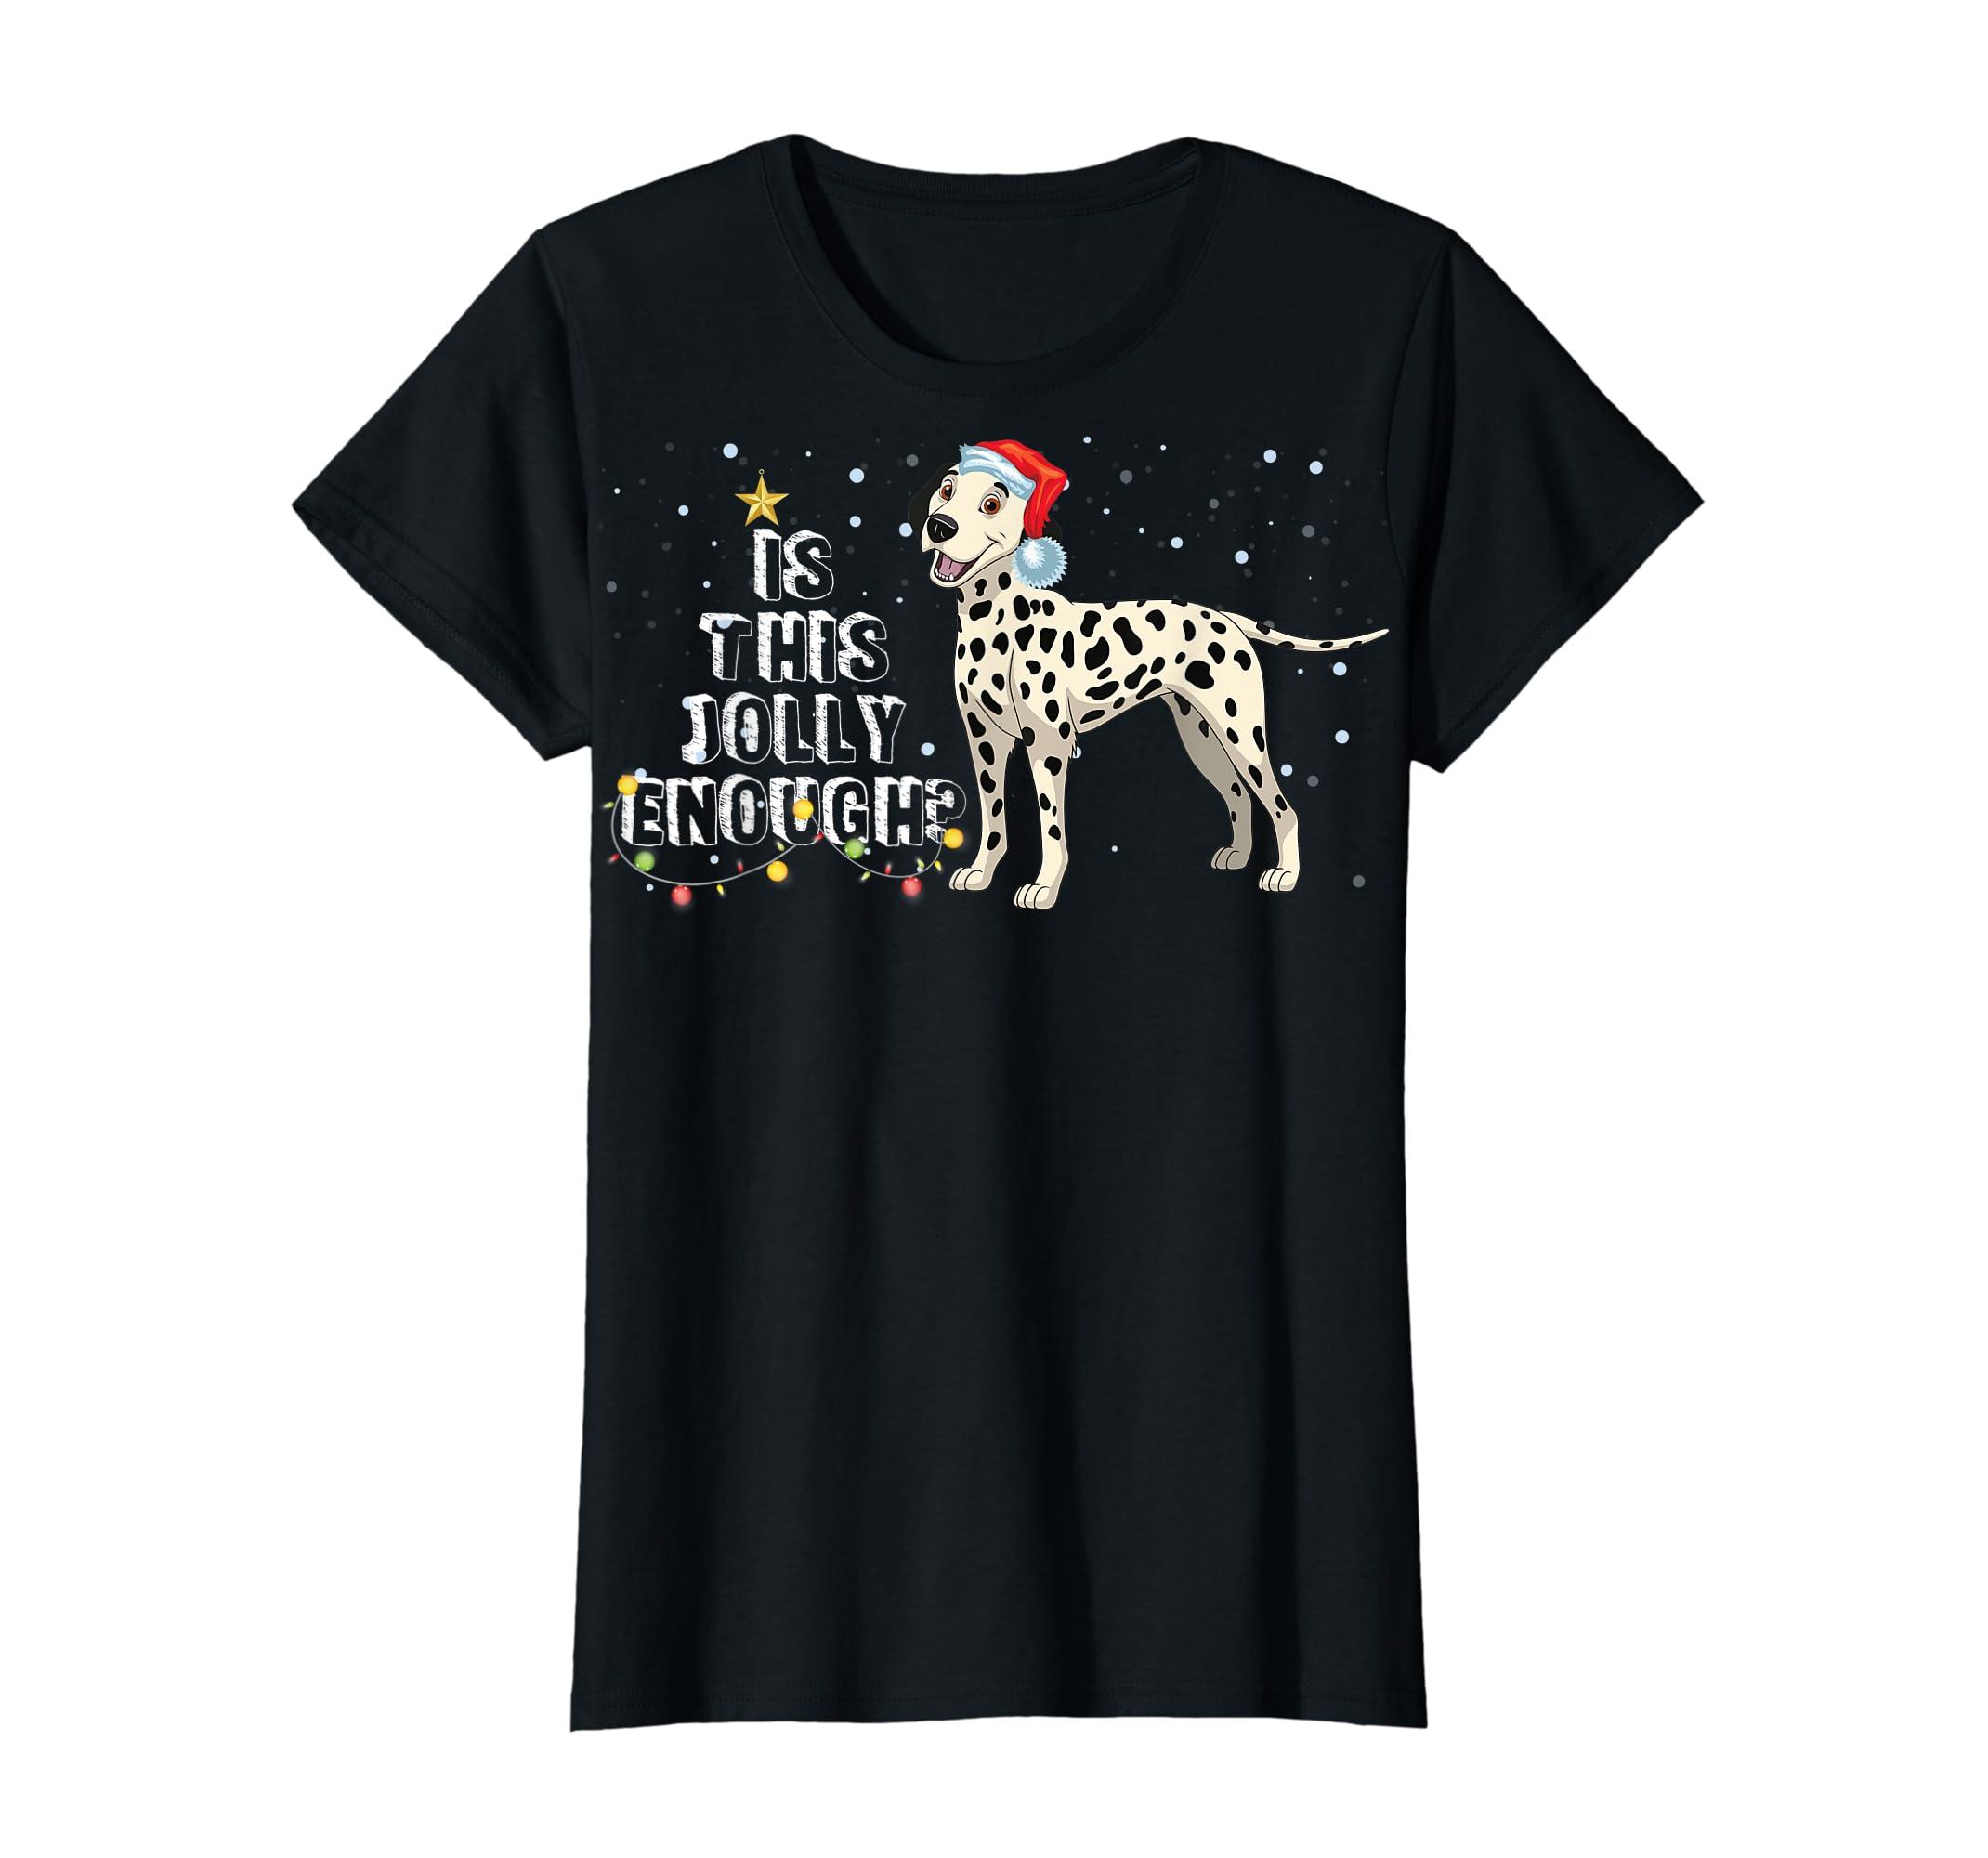 Dalmatian Santa Is This Jolly Enough Christmas Gifts T-Shirt-Women's T-Shirt-Black